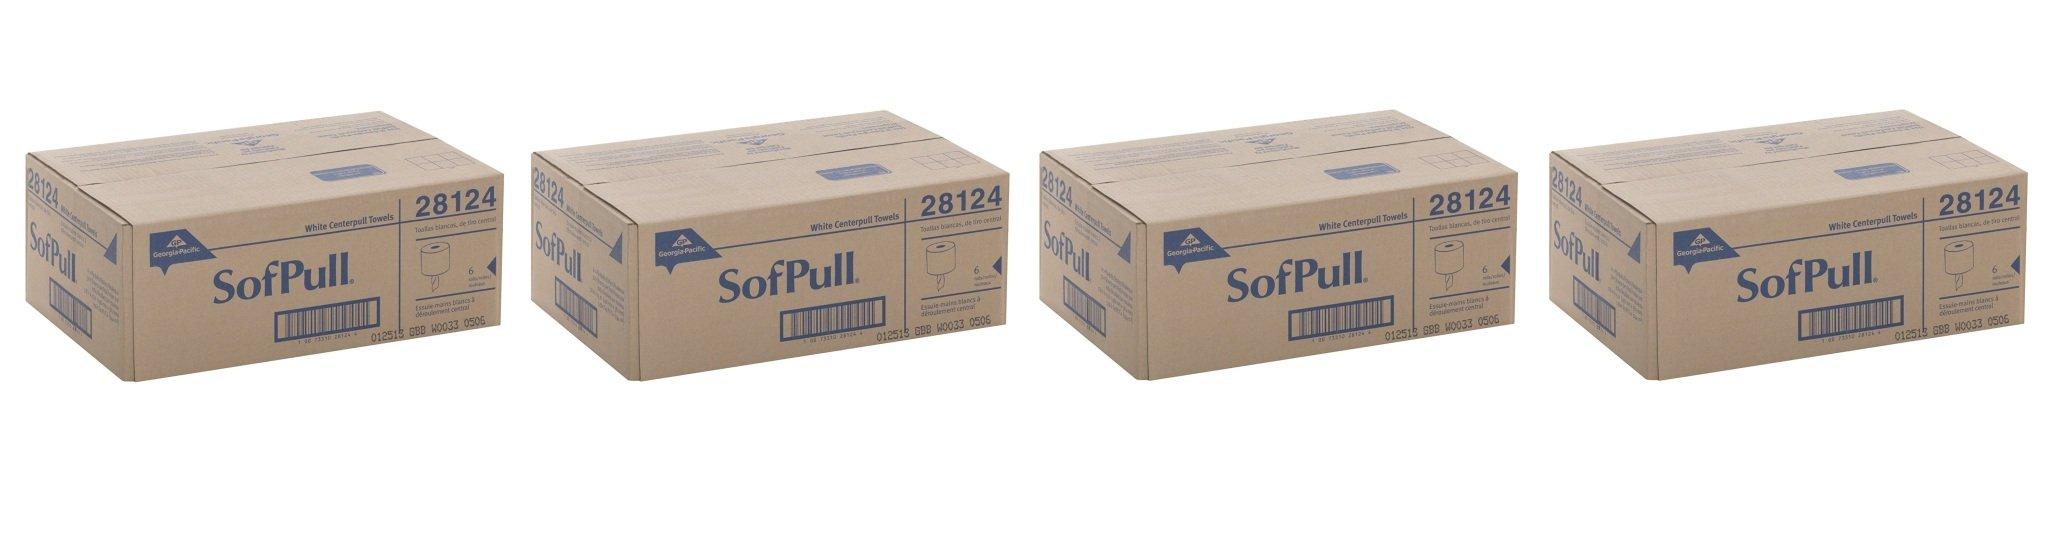 Georgia-Pacific SofPull 28124 White IoYBjS Premium 1-Ply Regular Capacity Centerpull Paper Towel, 4Pack (6 Rolls)